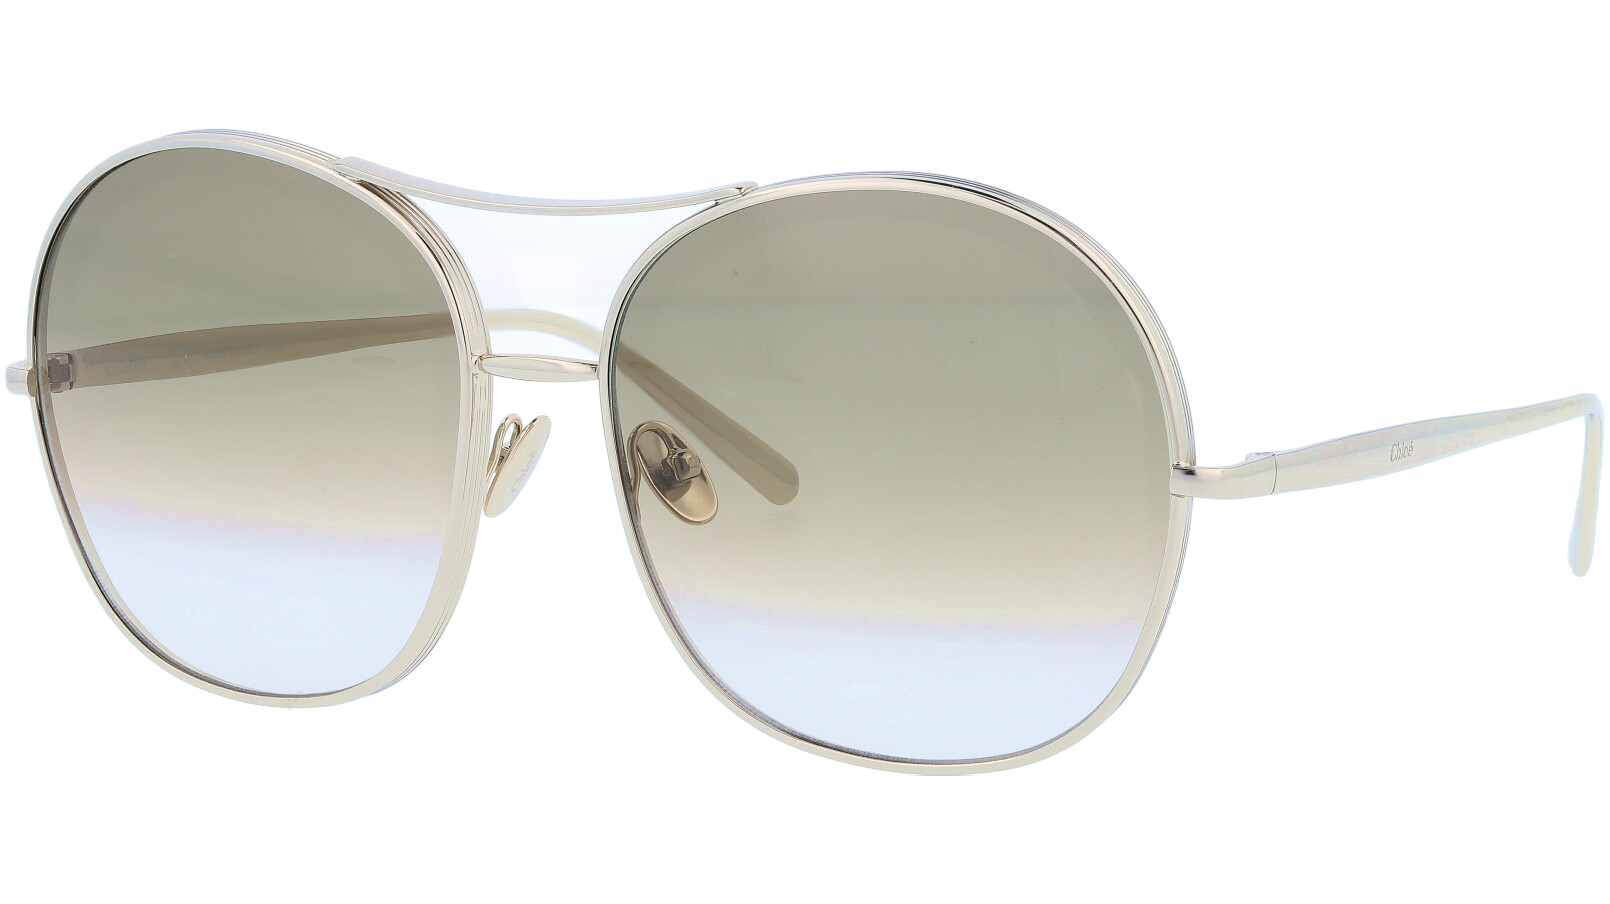 CHLOE CE128S 750 61 Gold Khaki Round Sunglasses